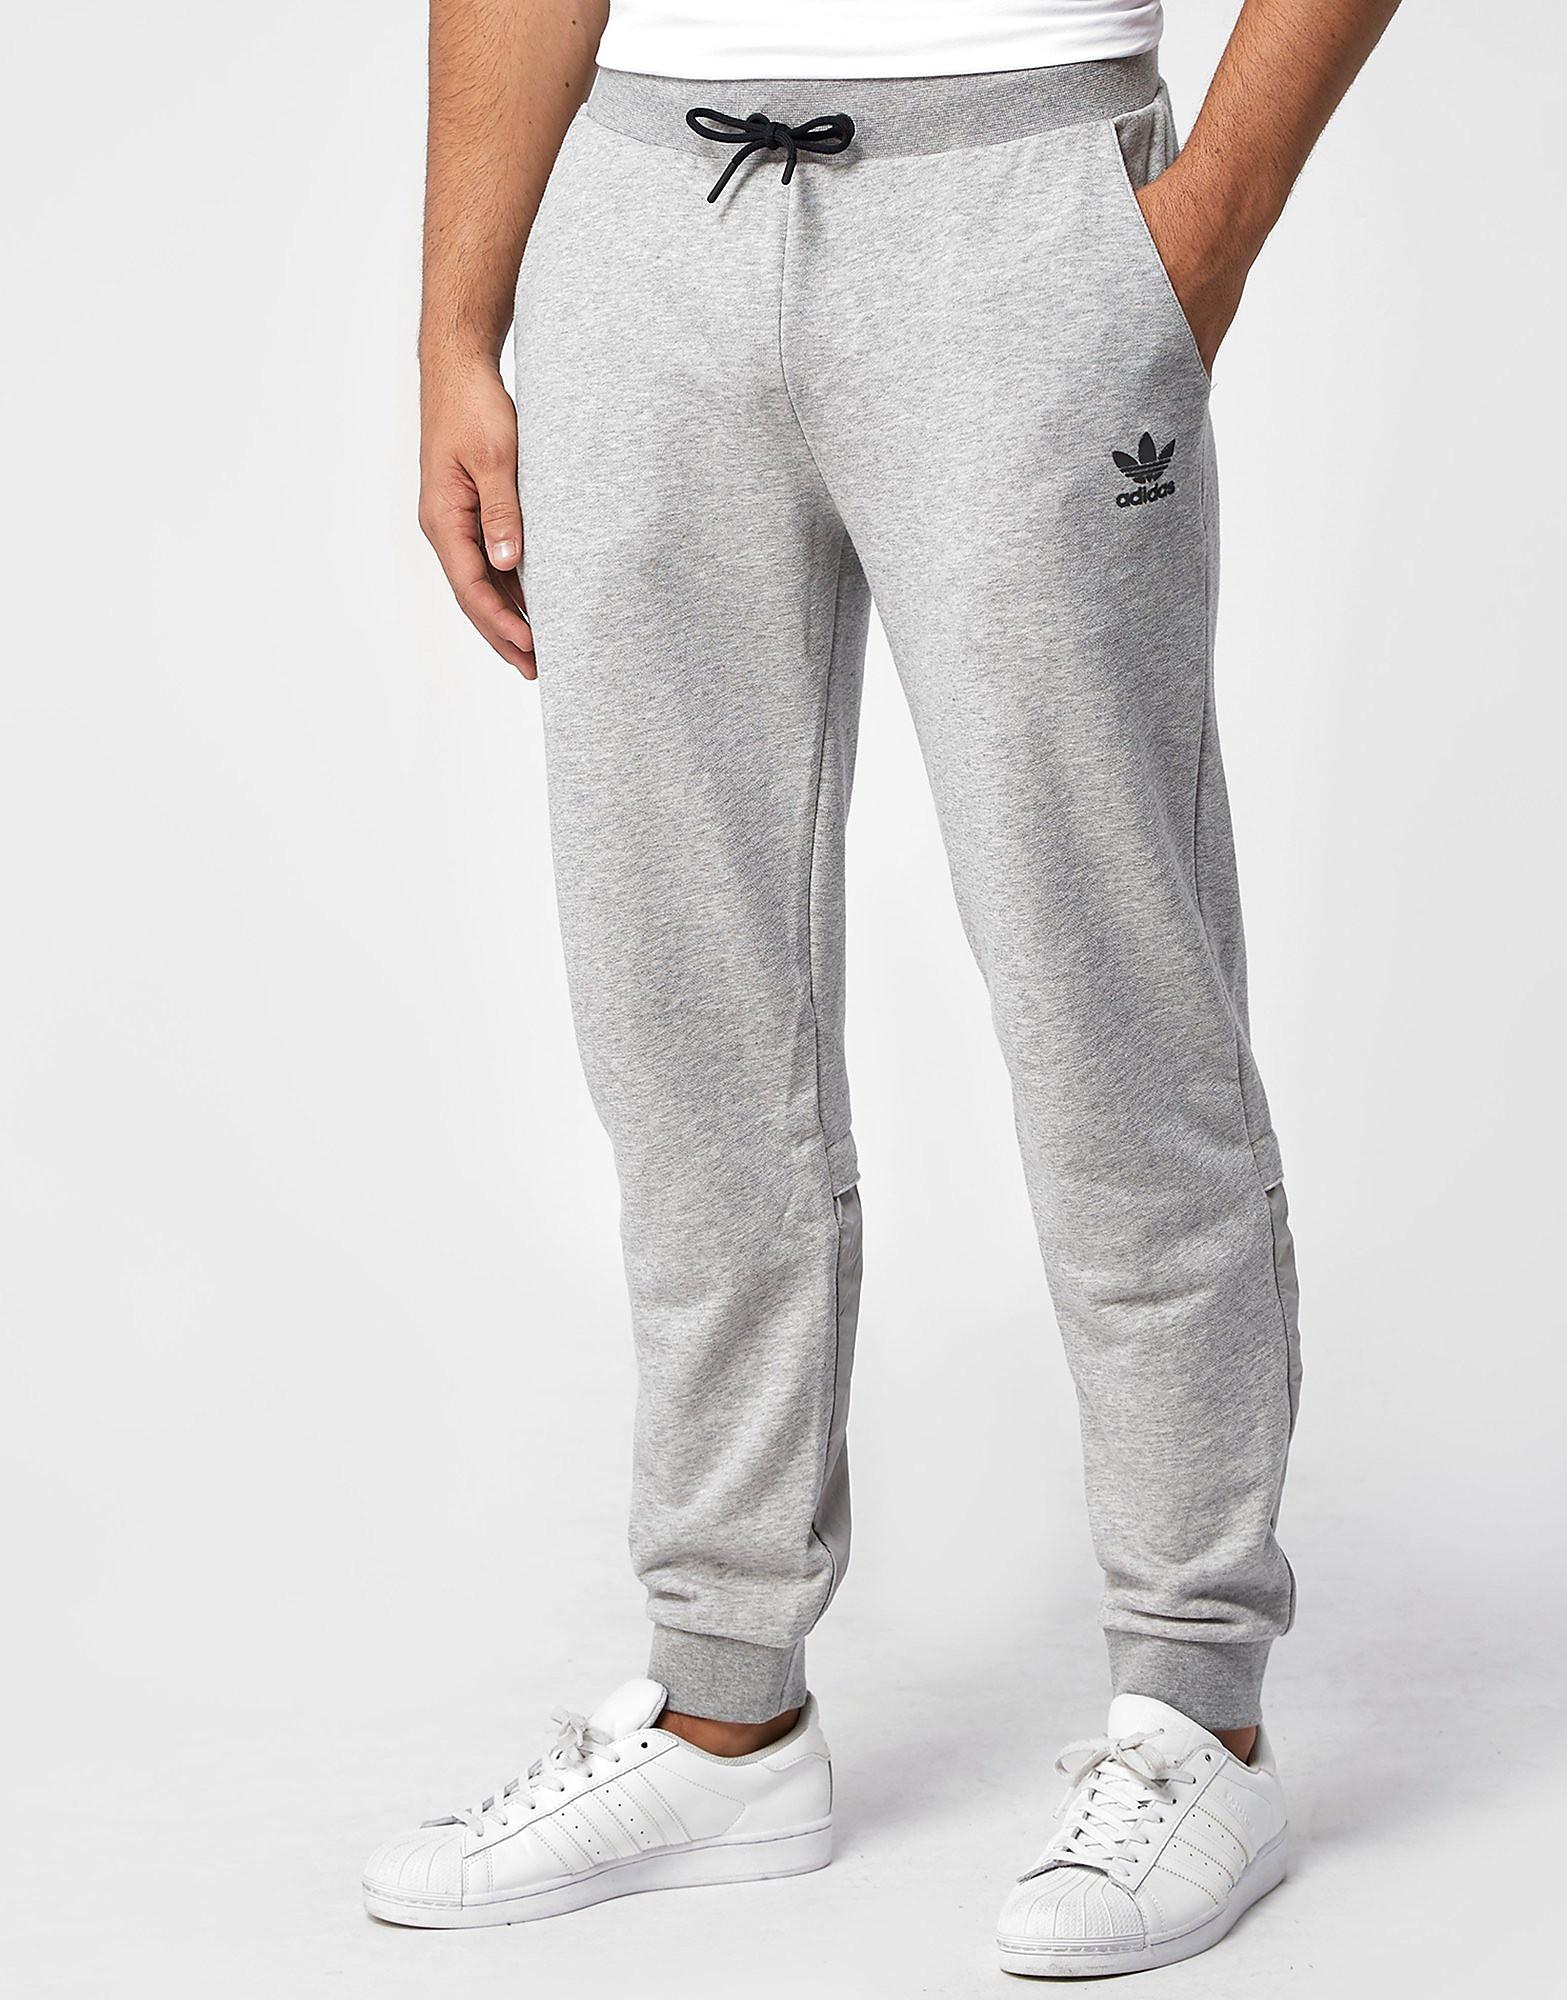 adidas Originals Sport Luxe Cuffed Track Pants  Grey Grey